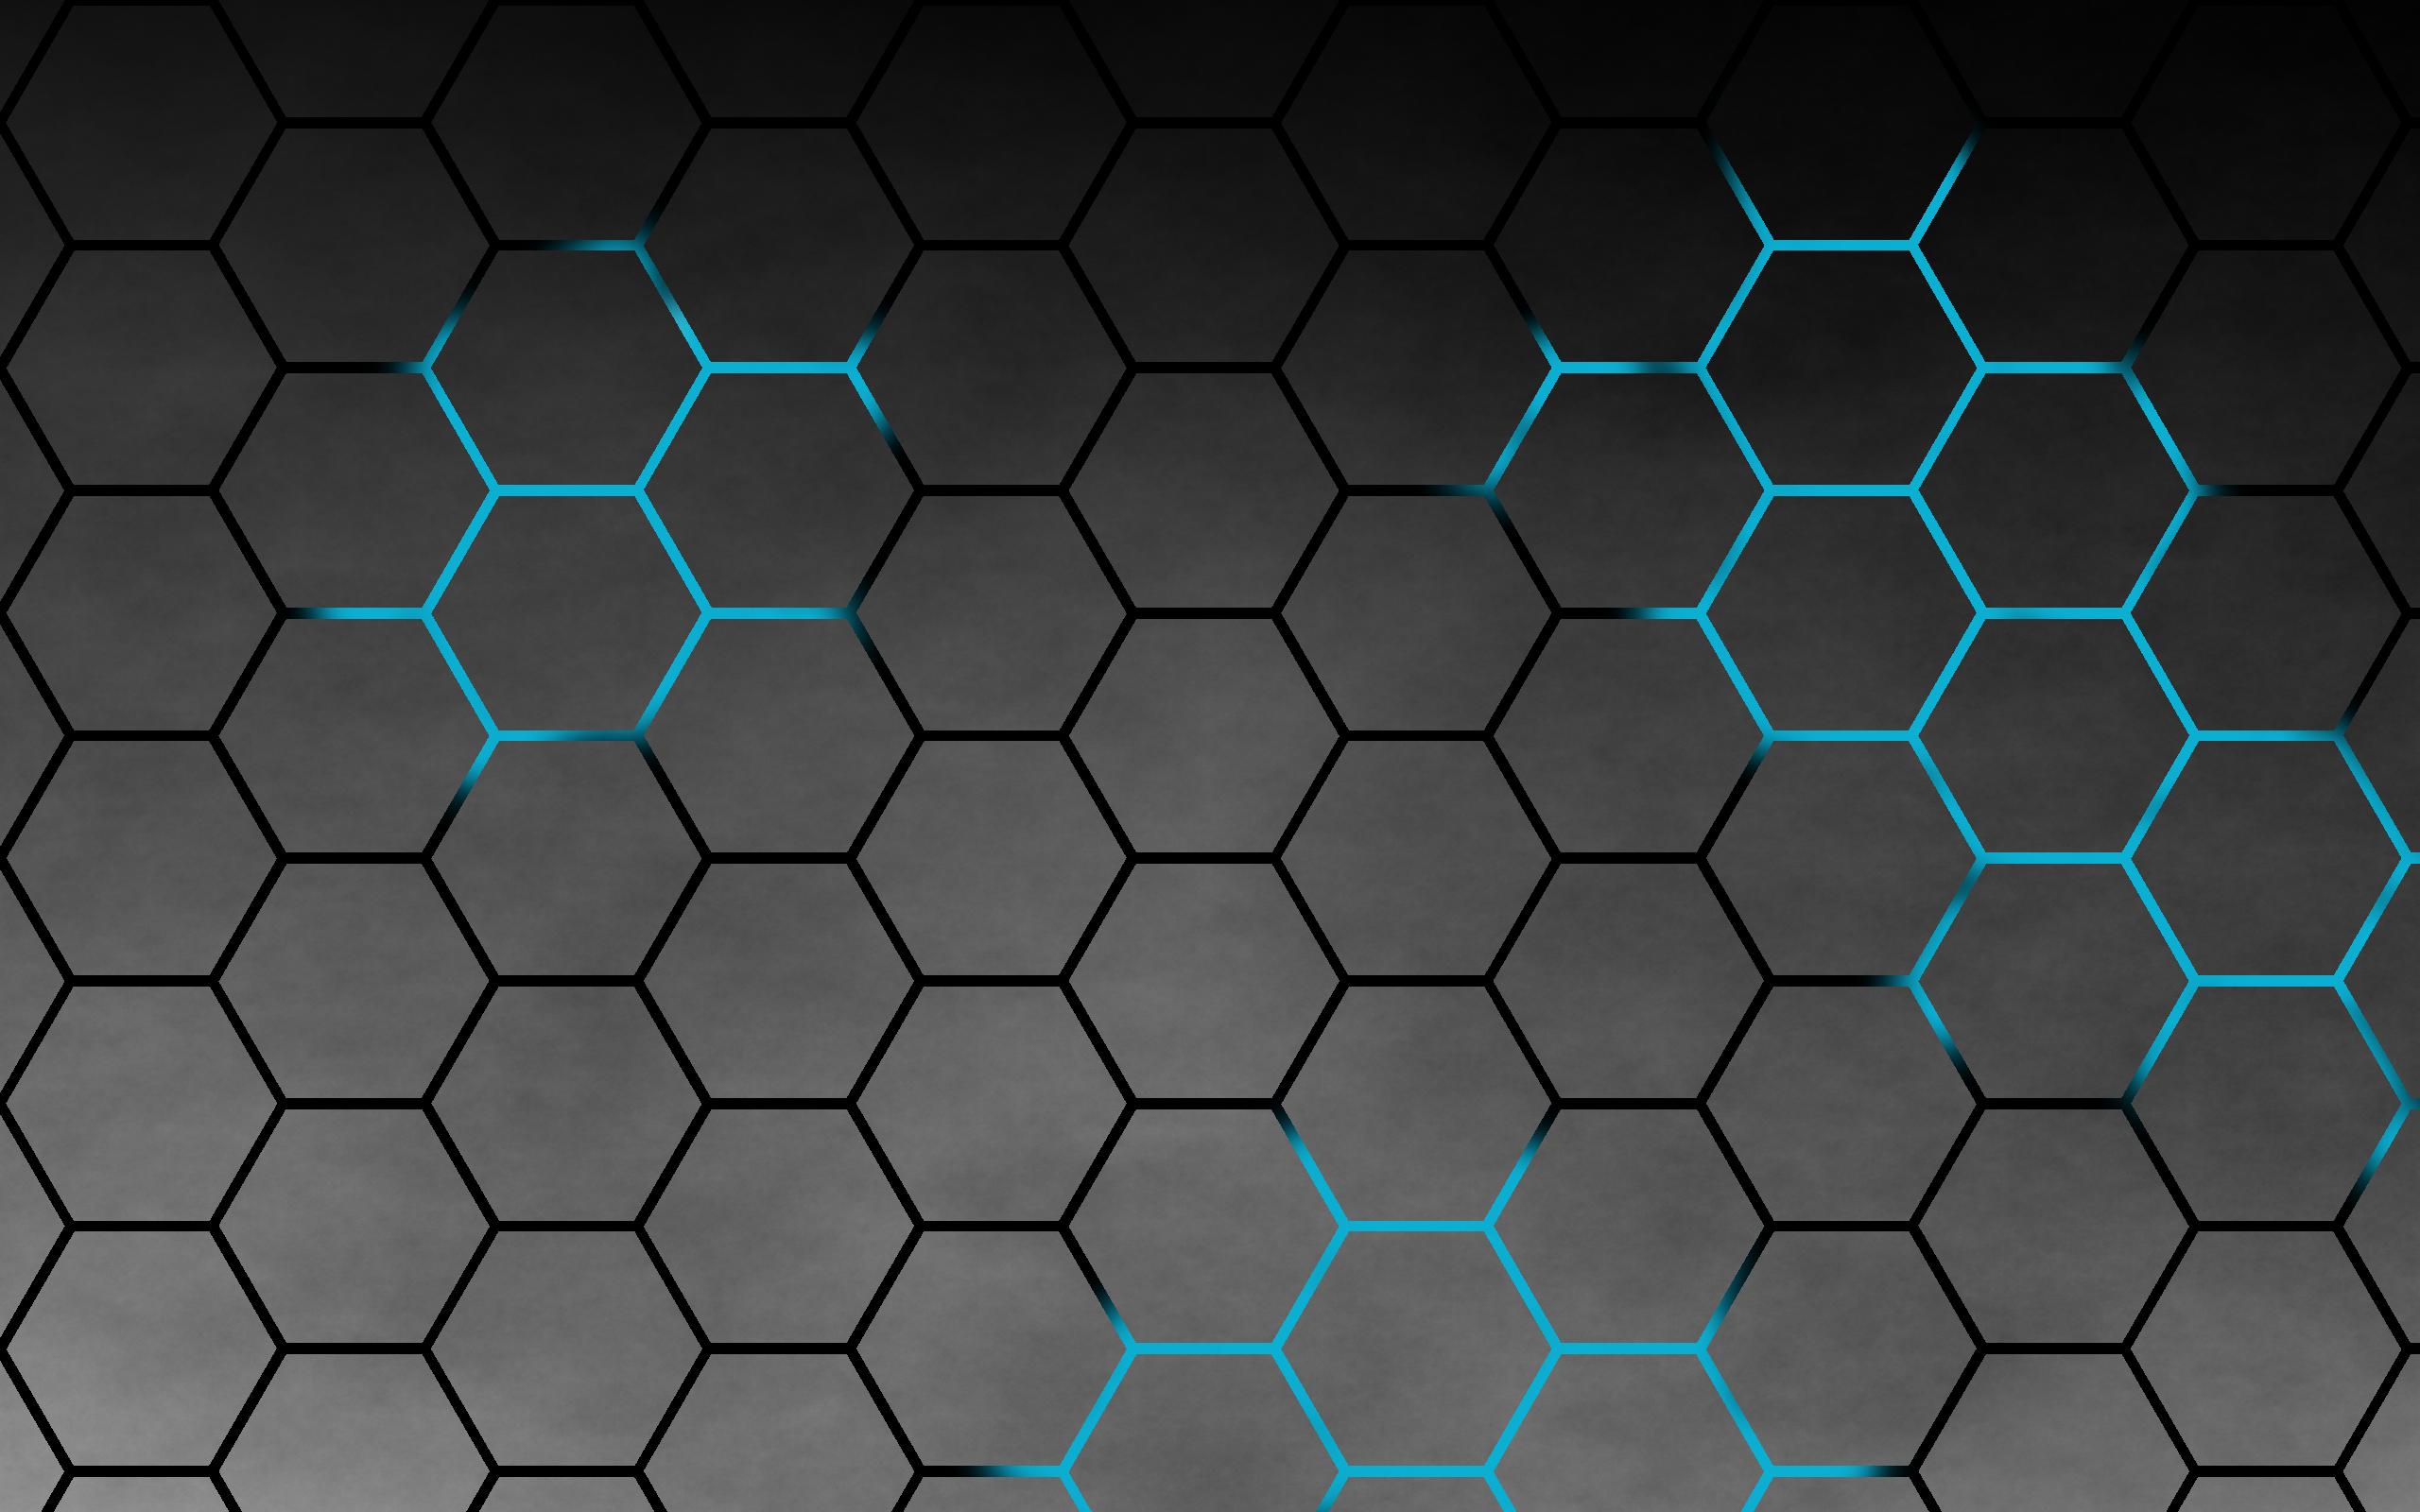 Honeycomb Google Search Honeycomb Wallpaper Laptop Wallpaper Hd Wallpapers For Laptop